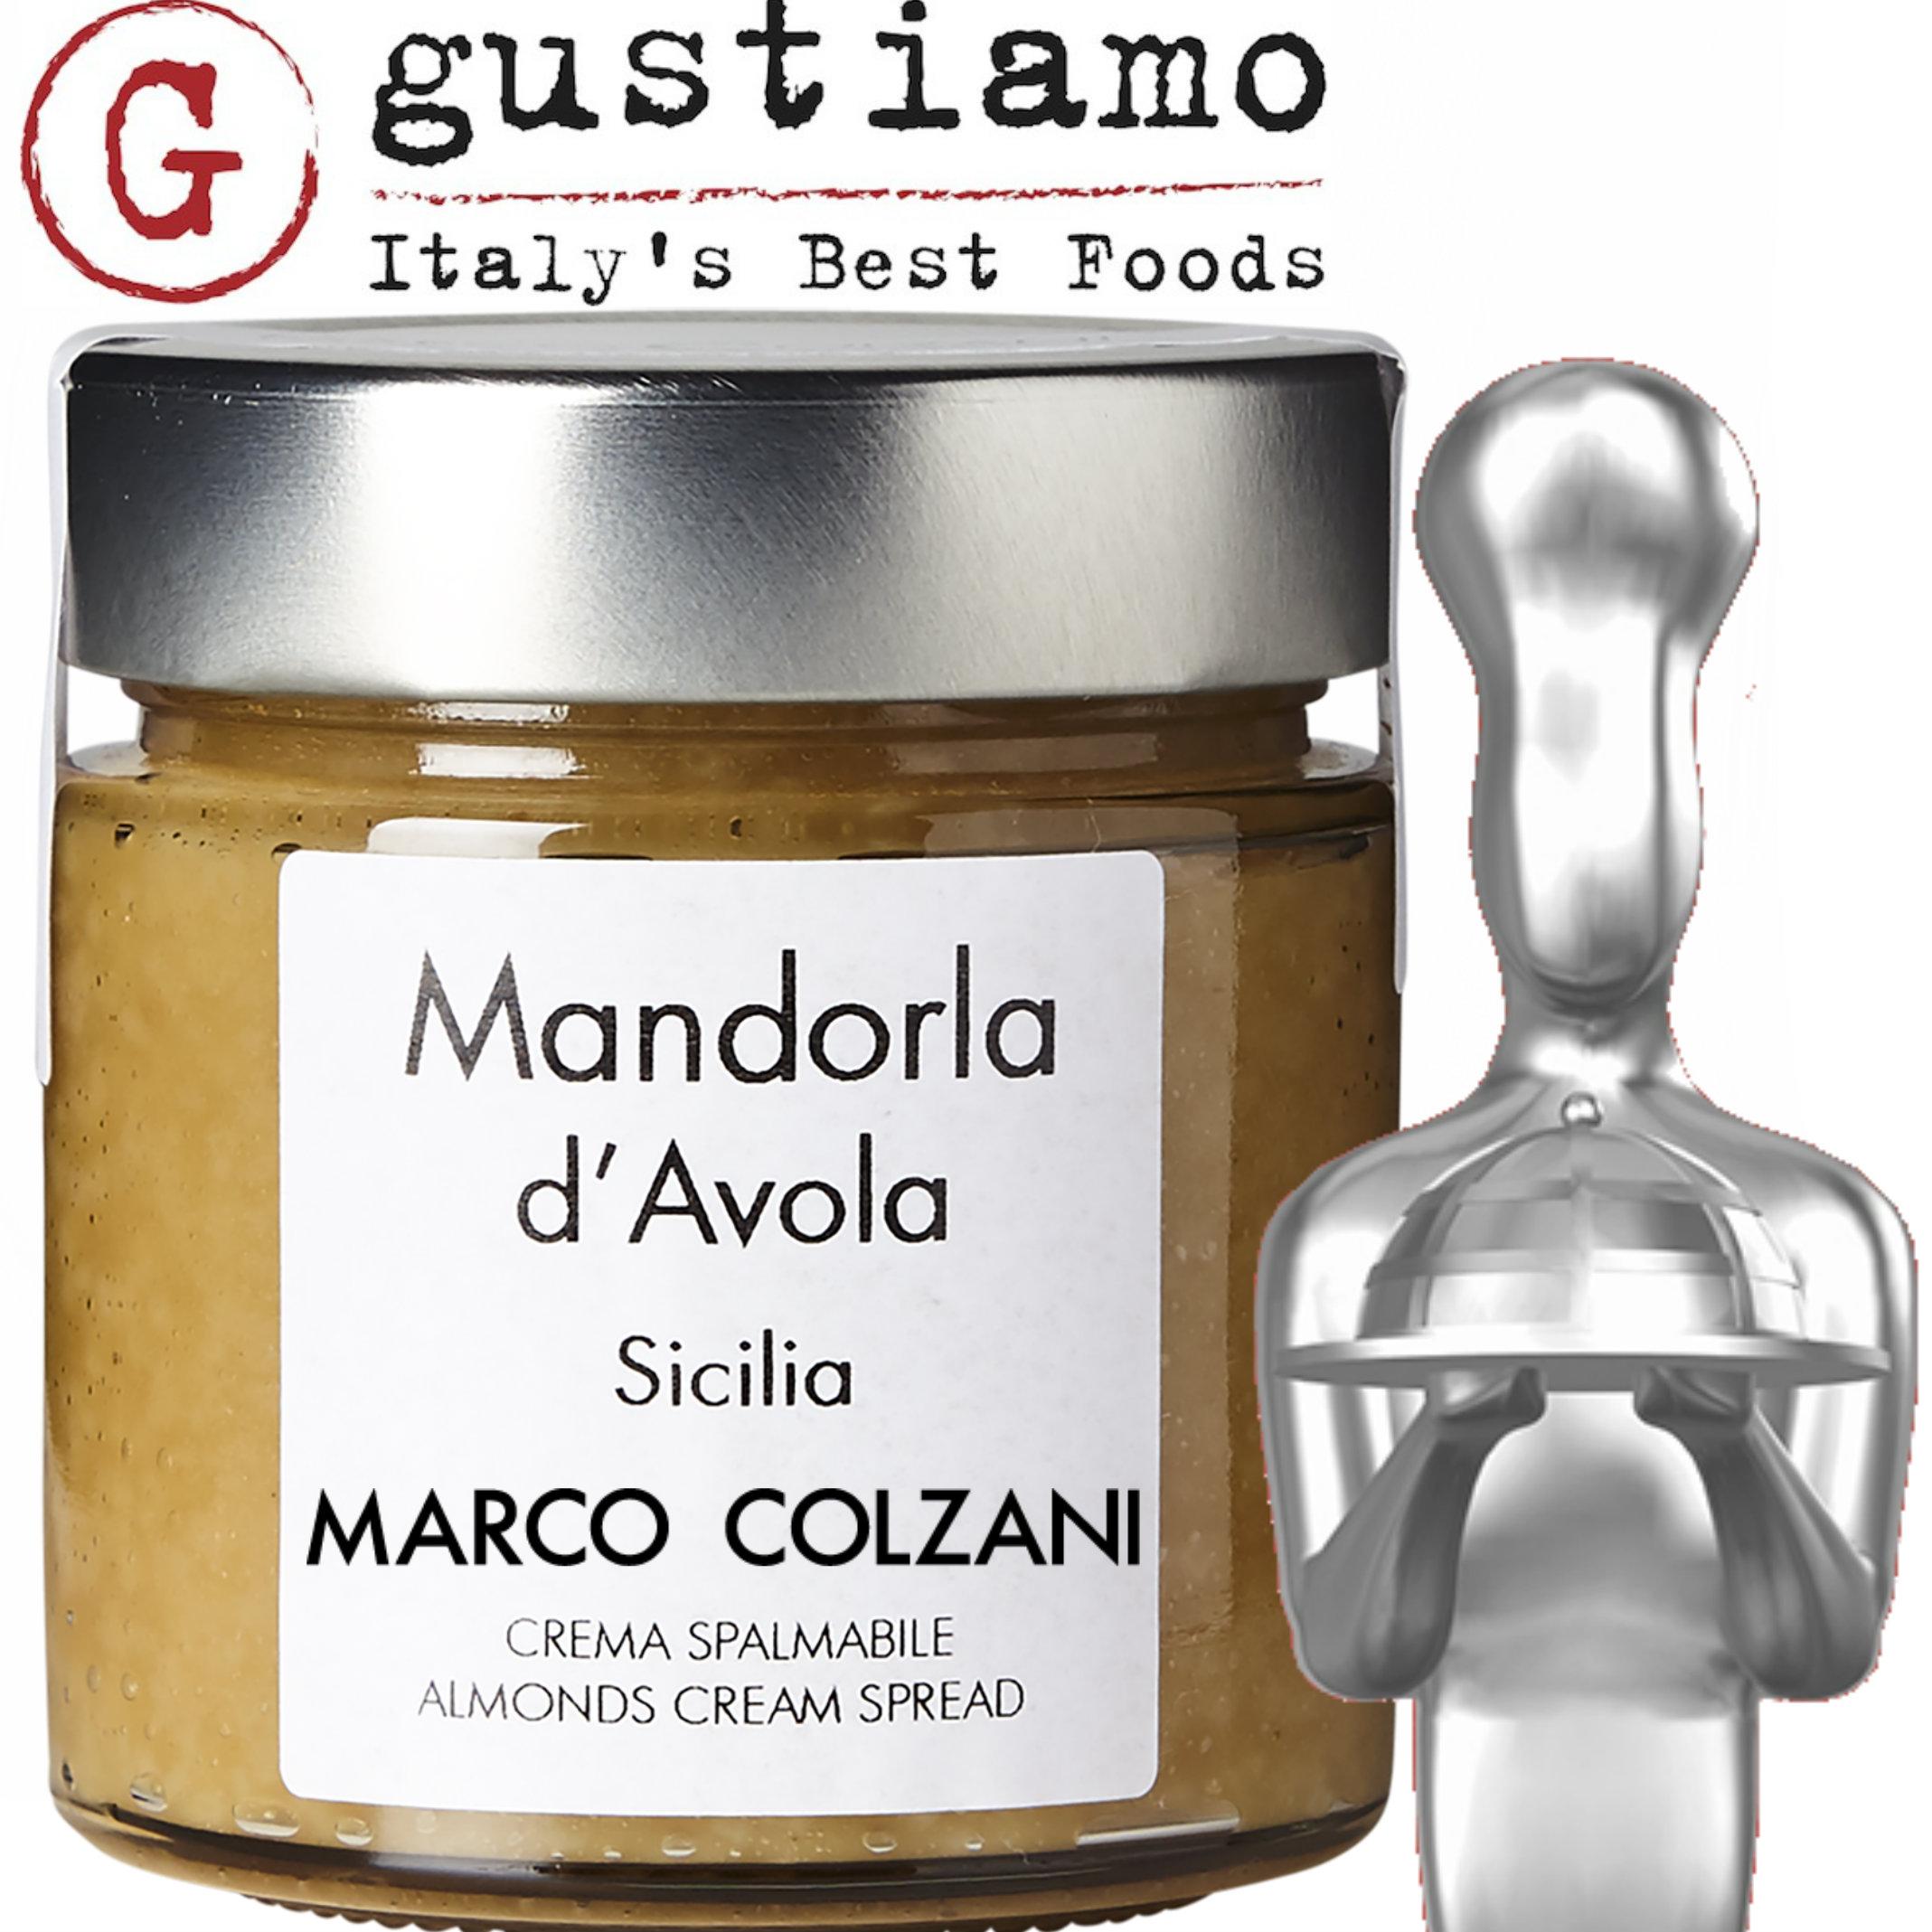 Marco Colzani Winner